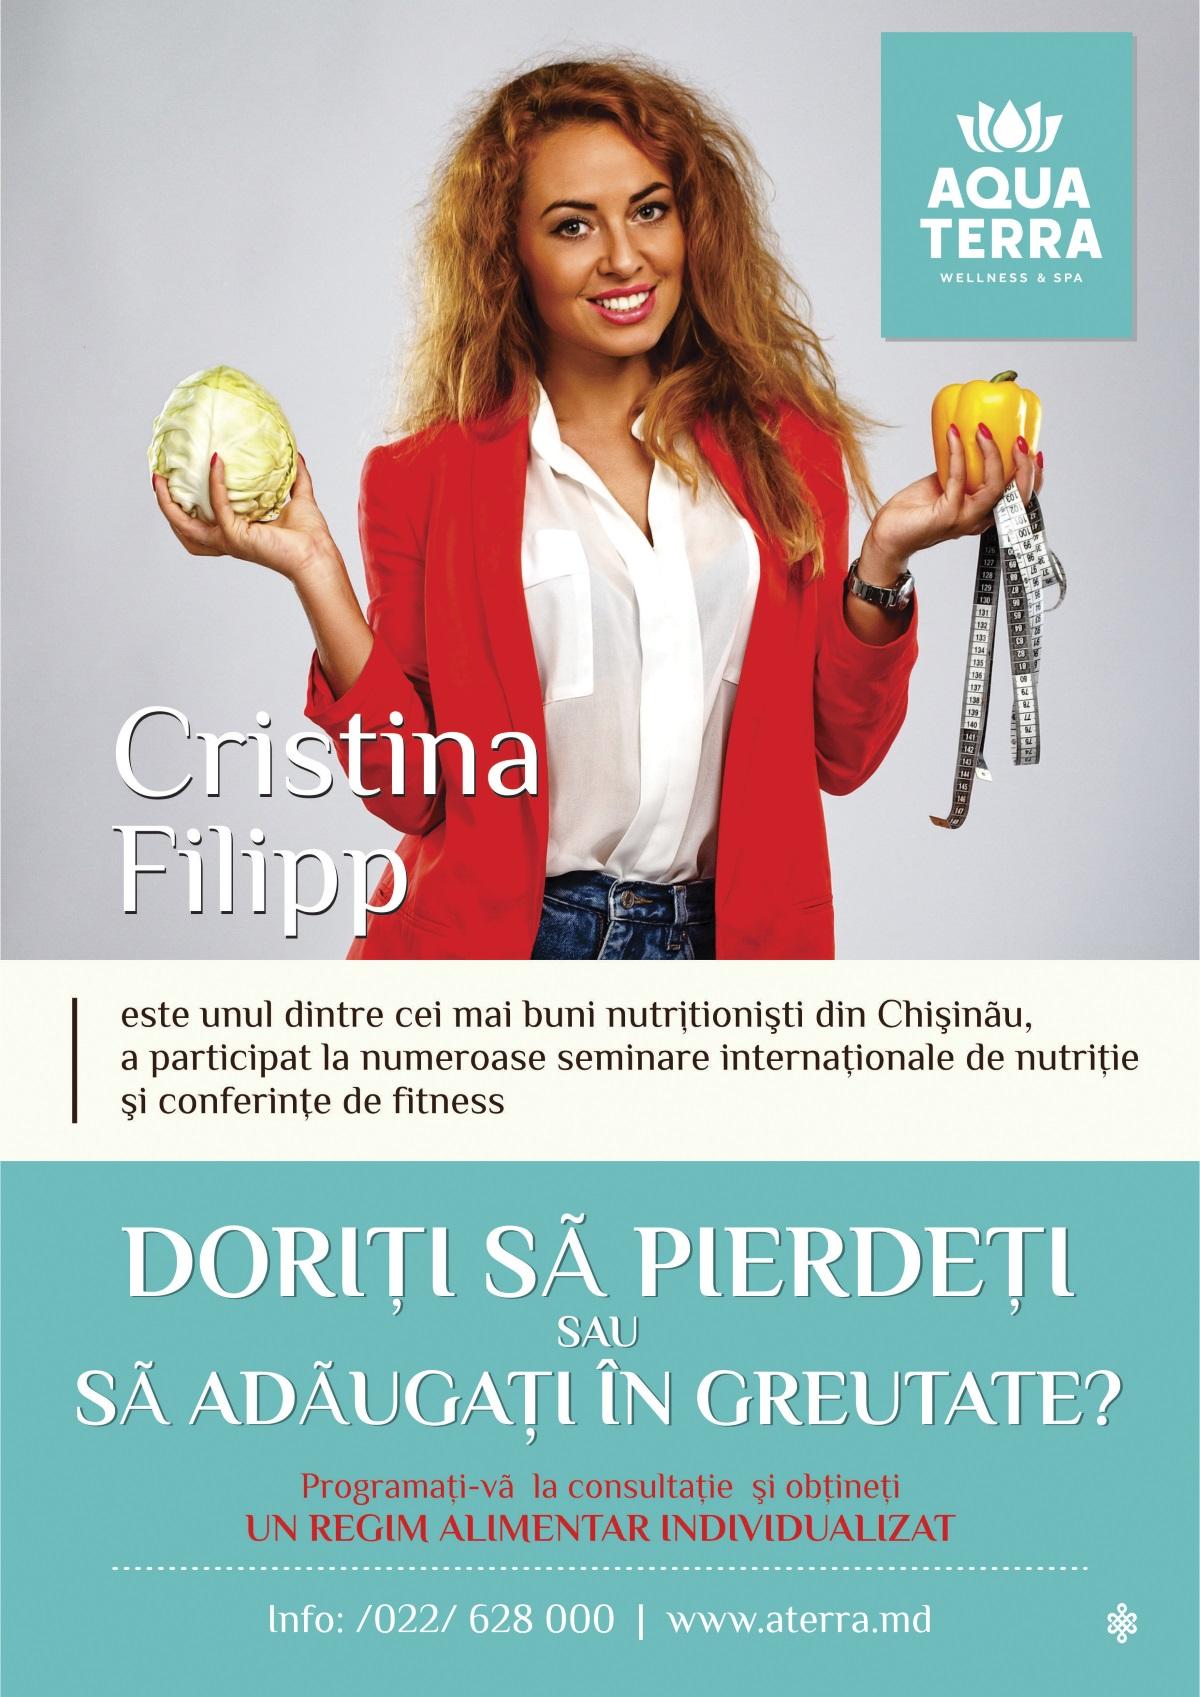 Cristina Filipp